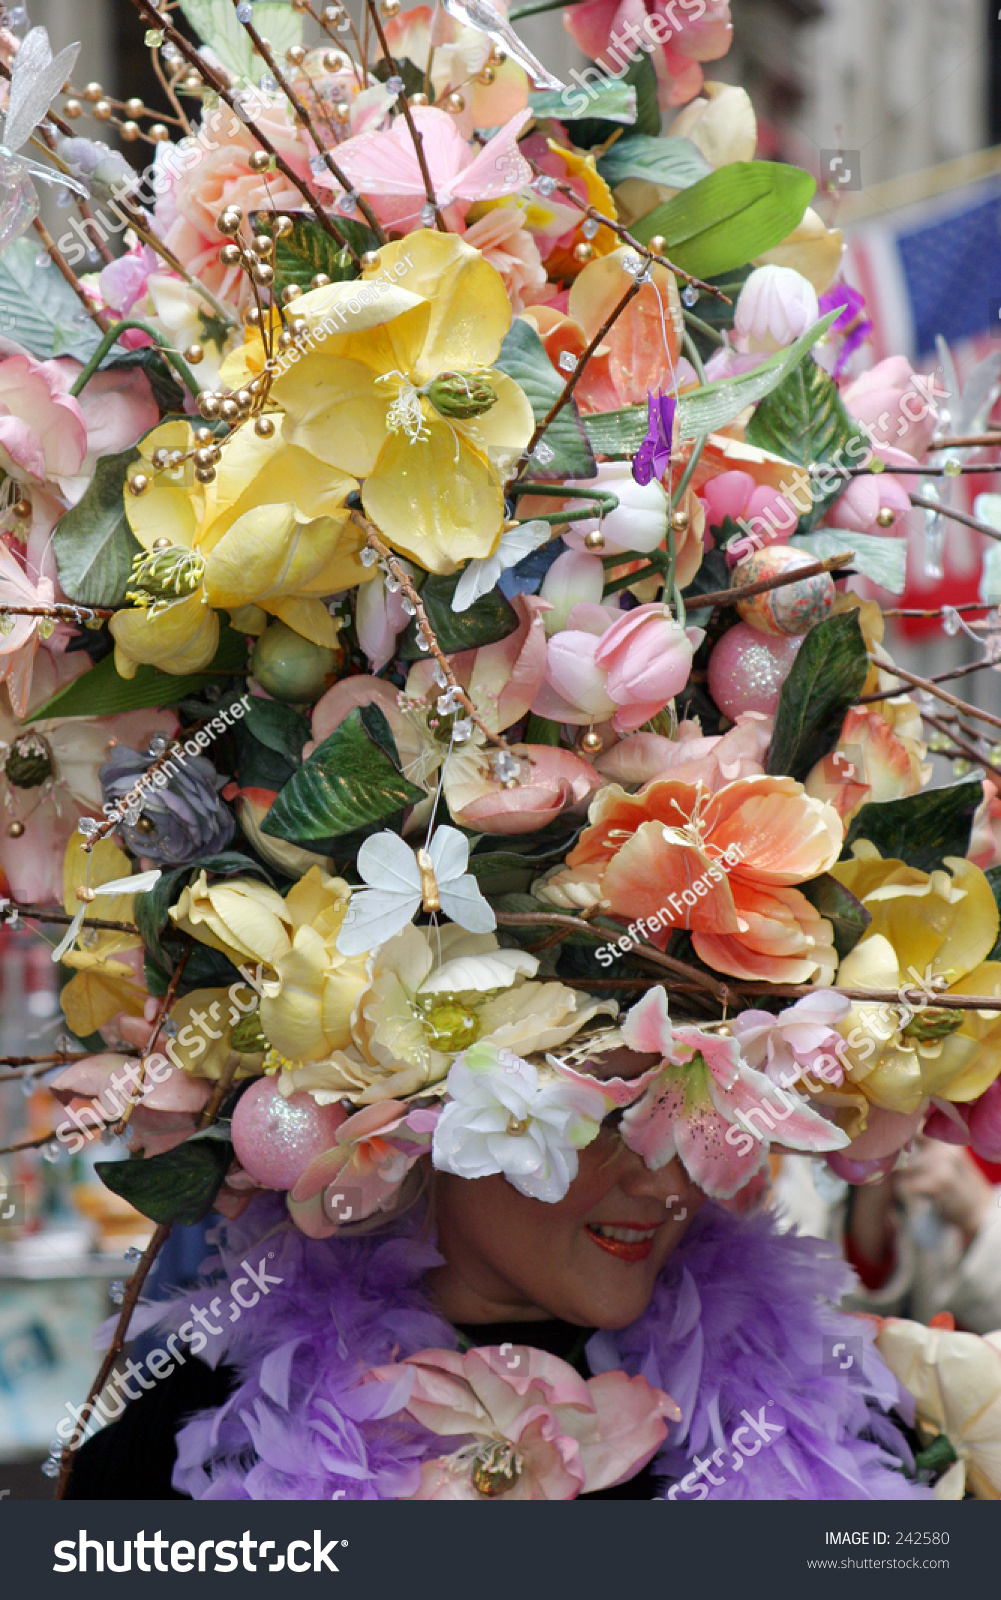 Giant Flower Hat Stock Photo (Royalty Free) 242580 - Shutterstock